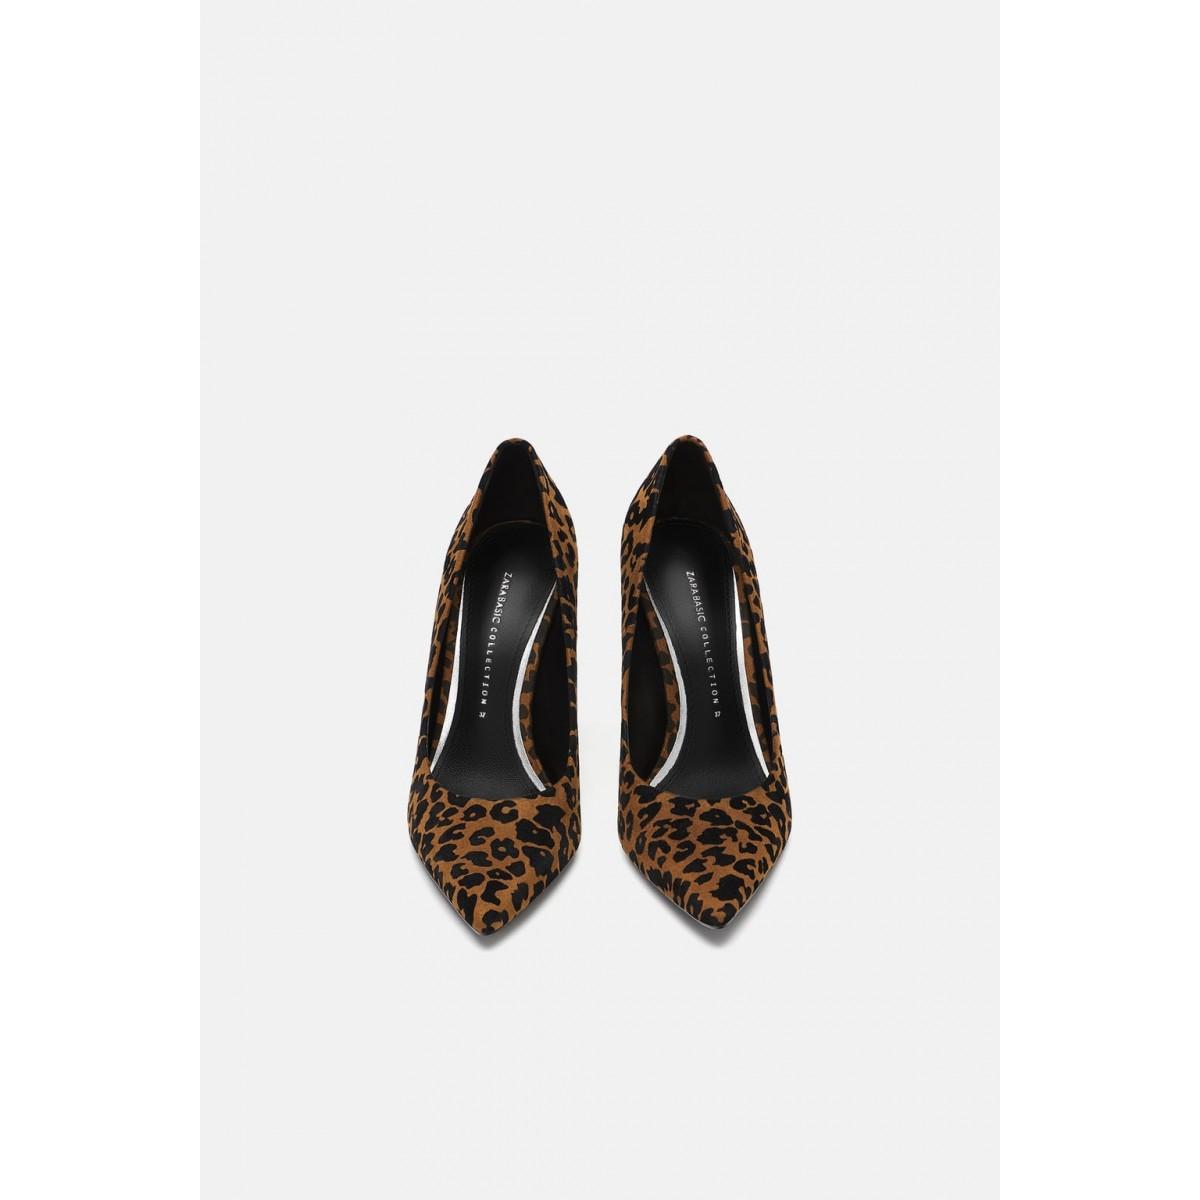 Zara Printed High Heeled Shoes (Leopard)